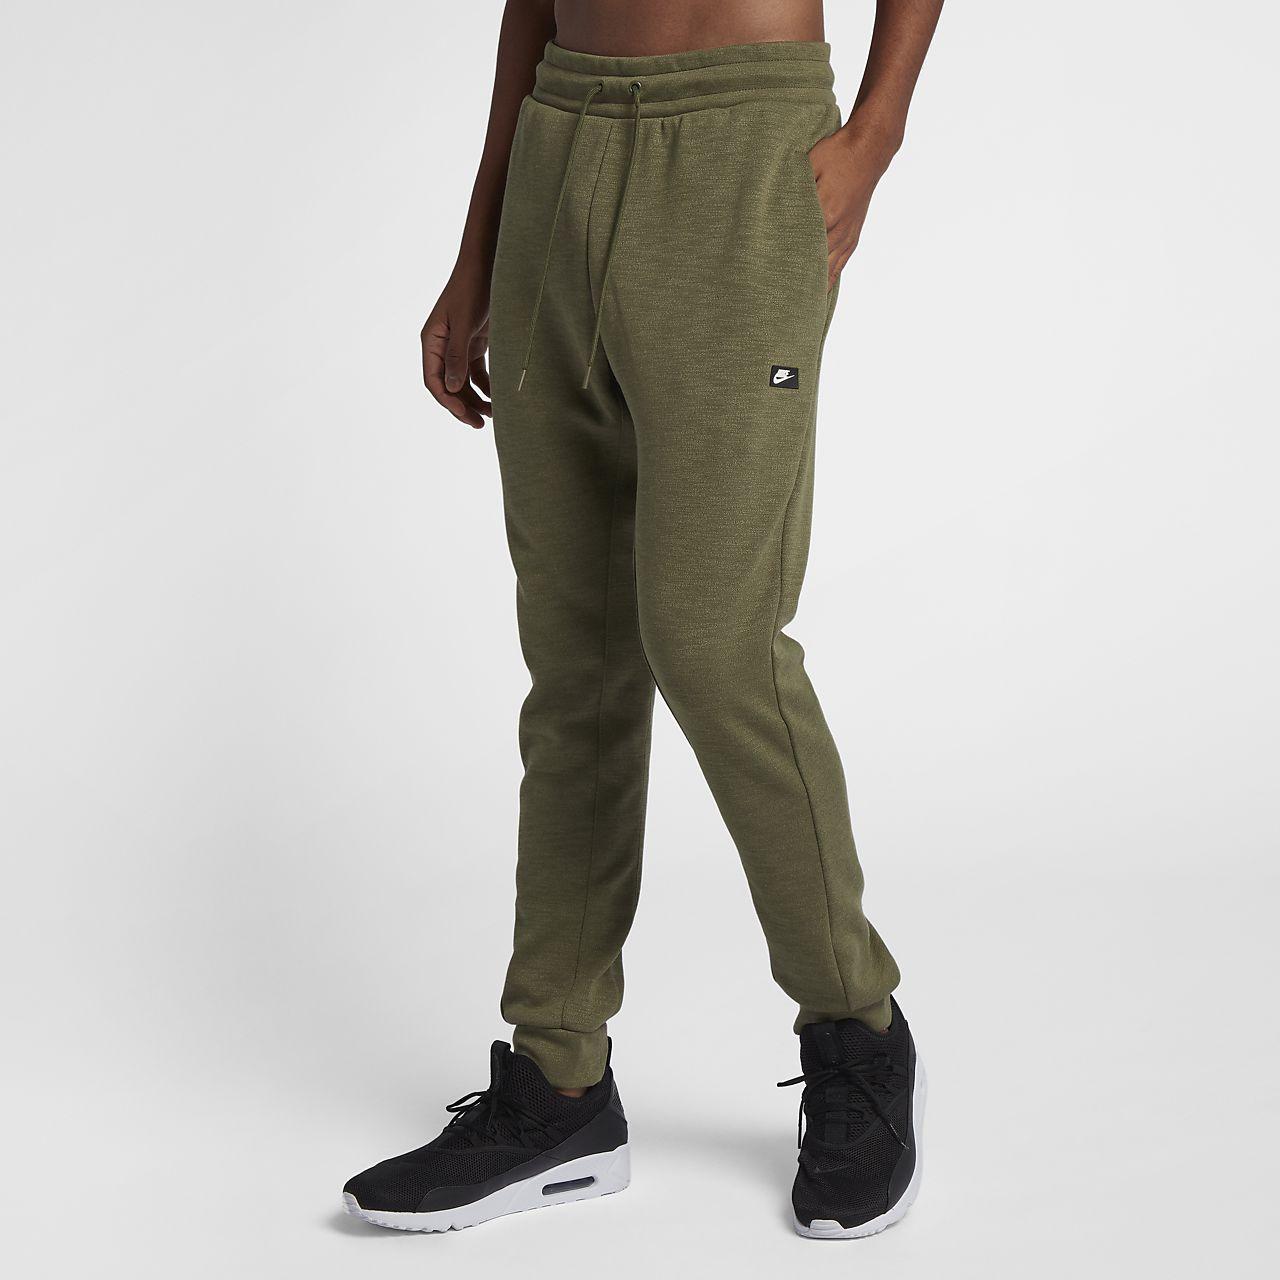 4562dc2067ed Pantalon de jogging Nike Sportswear pour Homme. Nike.com CA